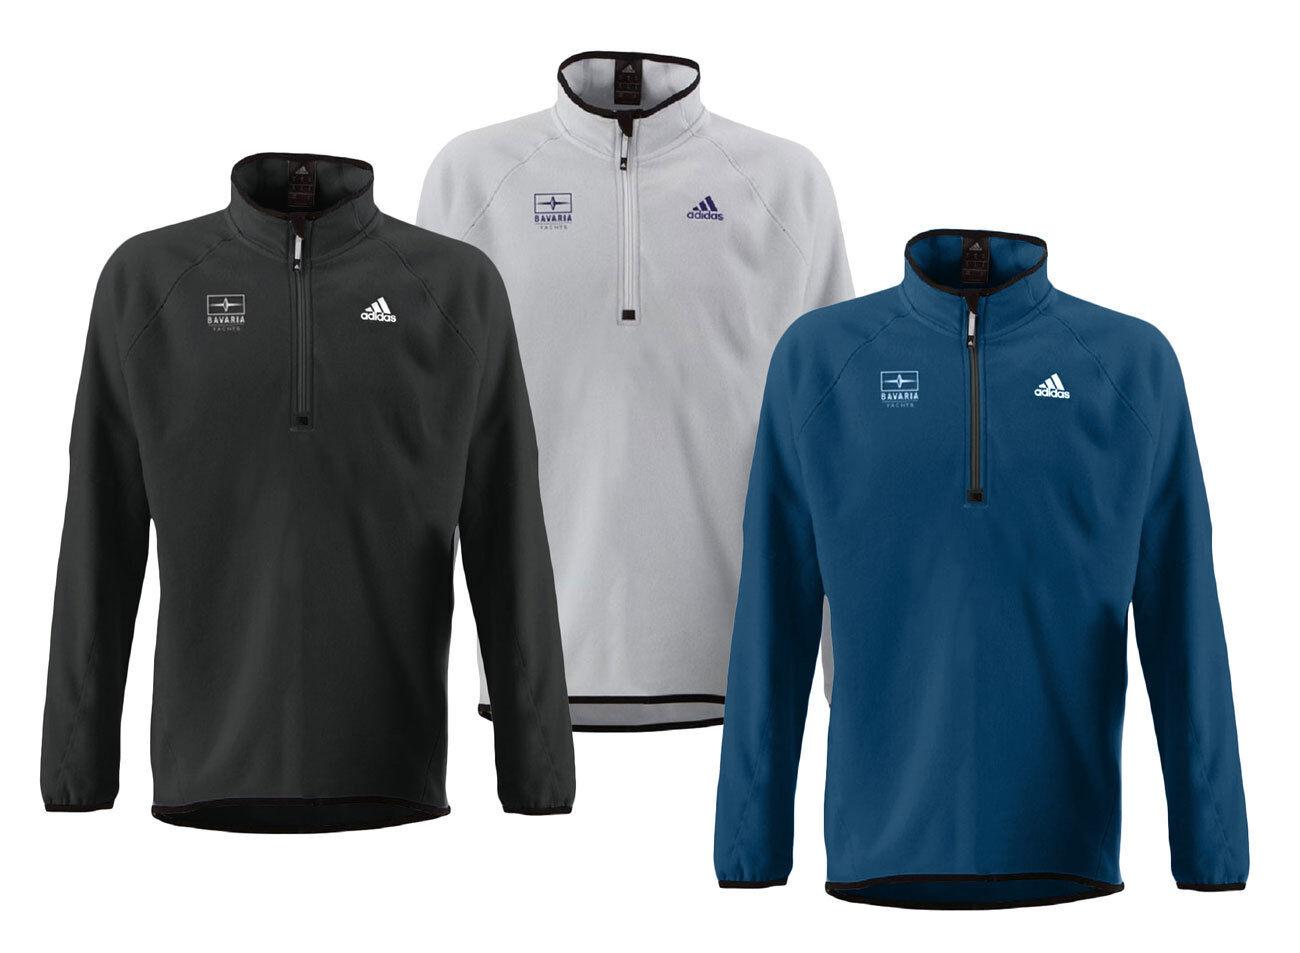 Adidas Sailing Men's Microfleece Function Shirt Sail Shirt Sportshirt Outdoor